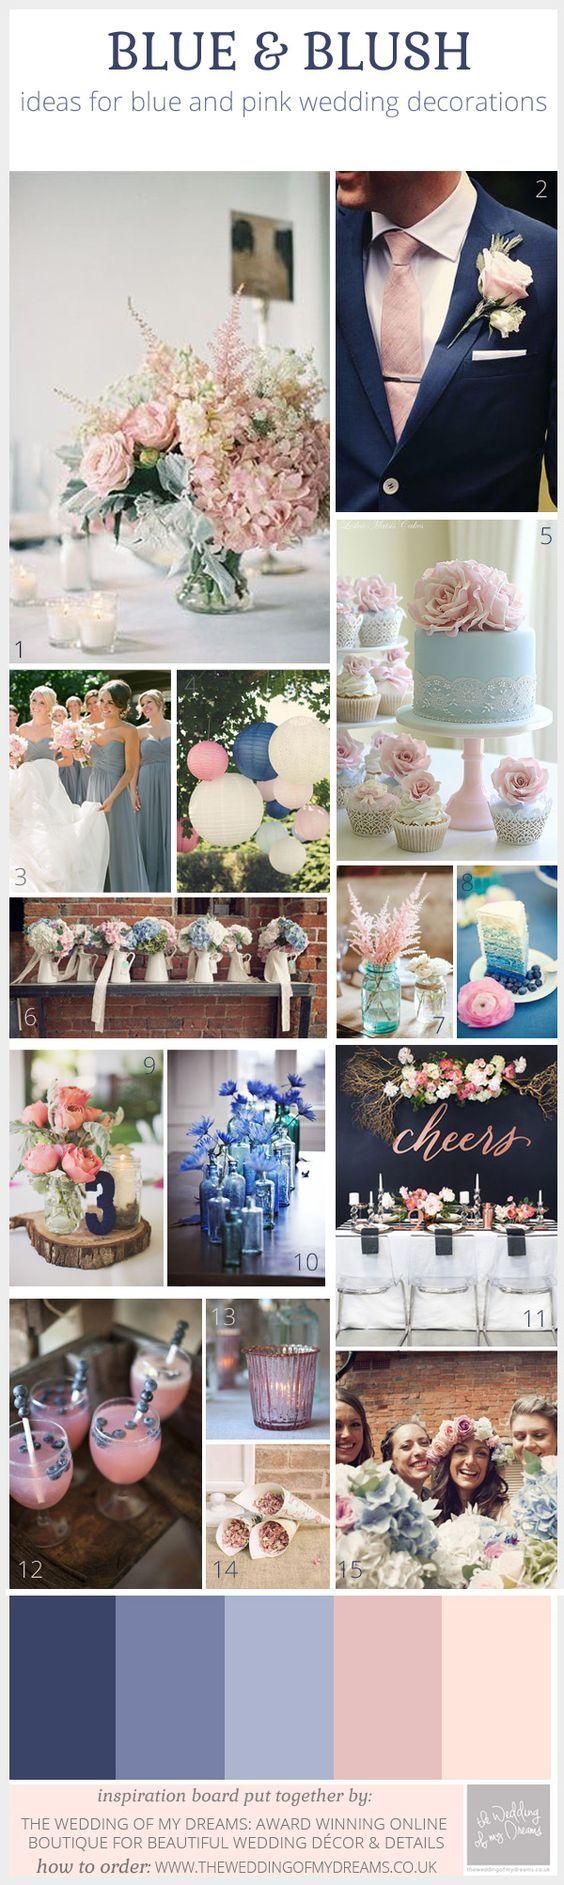 Wedding decorations dusty blue december 2018 Boda More  Wedding Color Pallets  Pinterest  Wedding Weddings